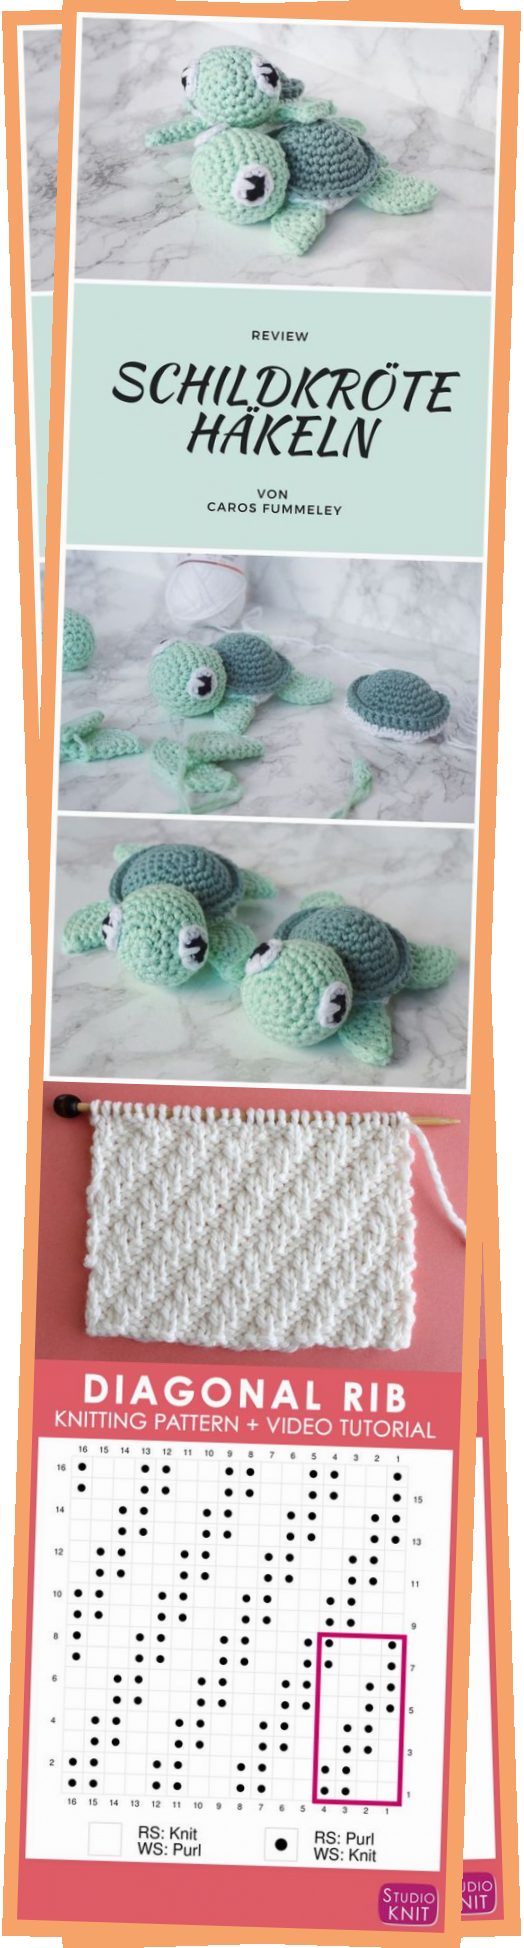 Photo of Amigurumi turtle crochet Caros Fummeley